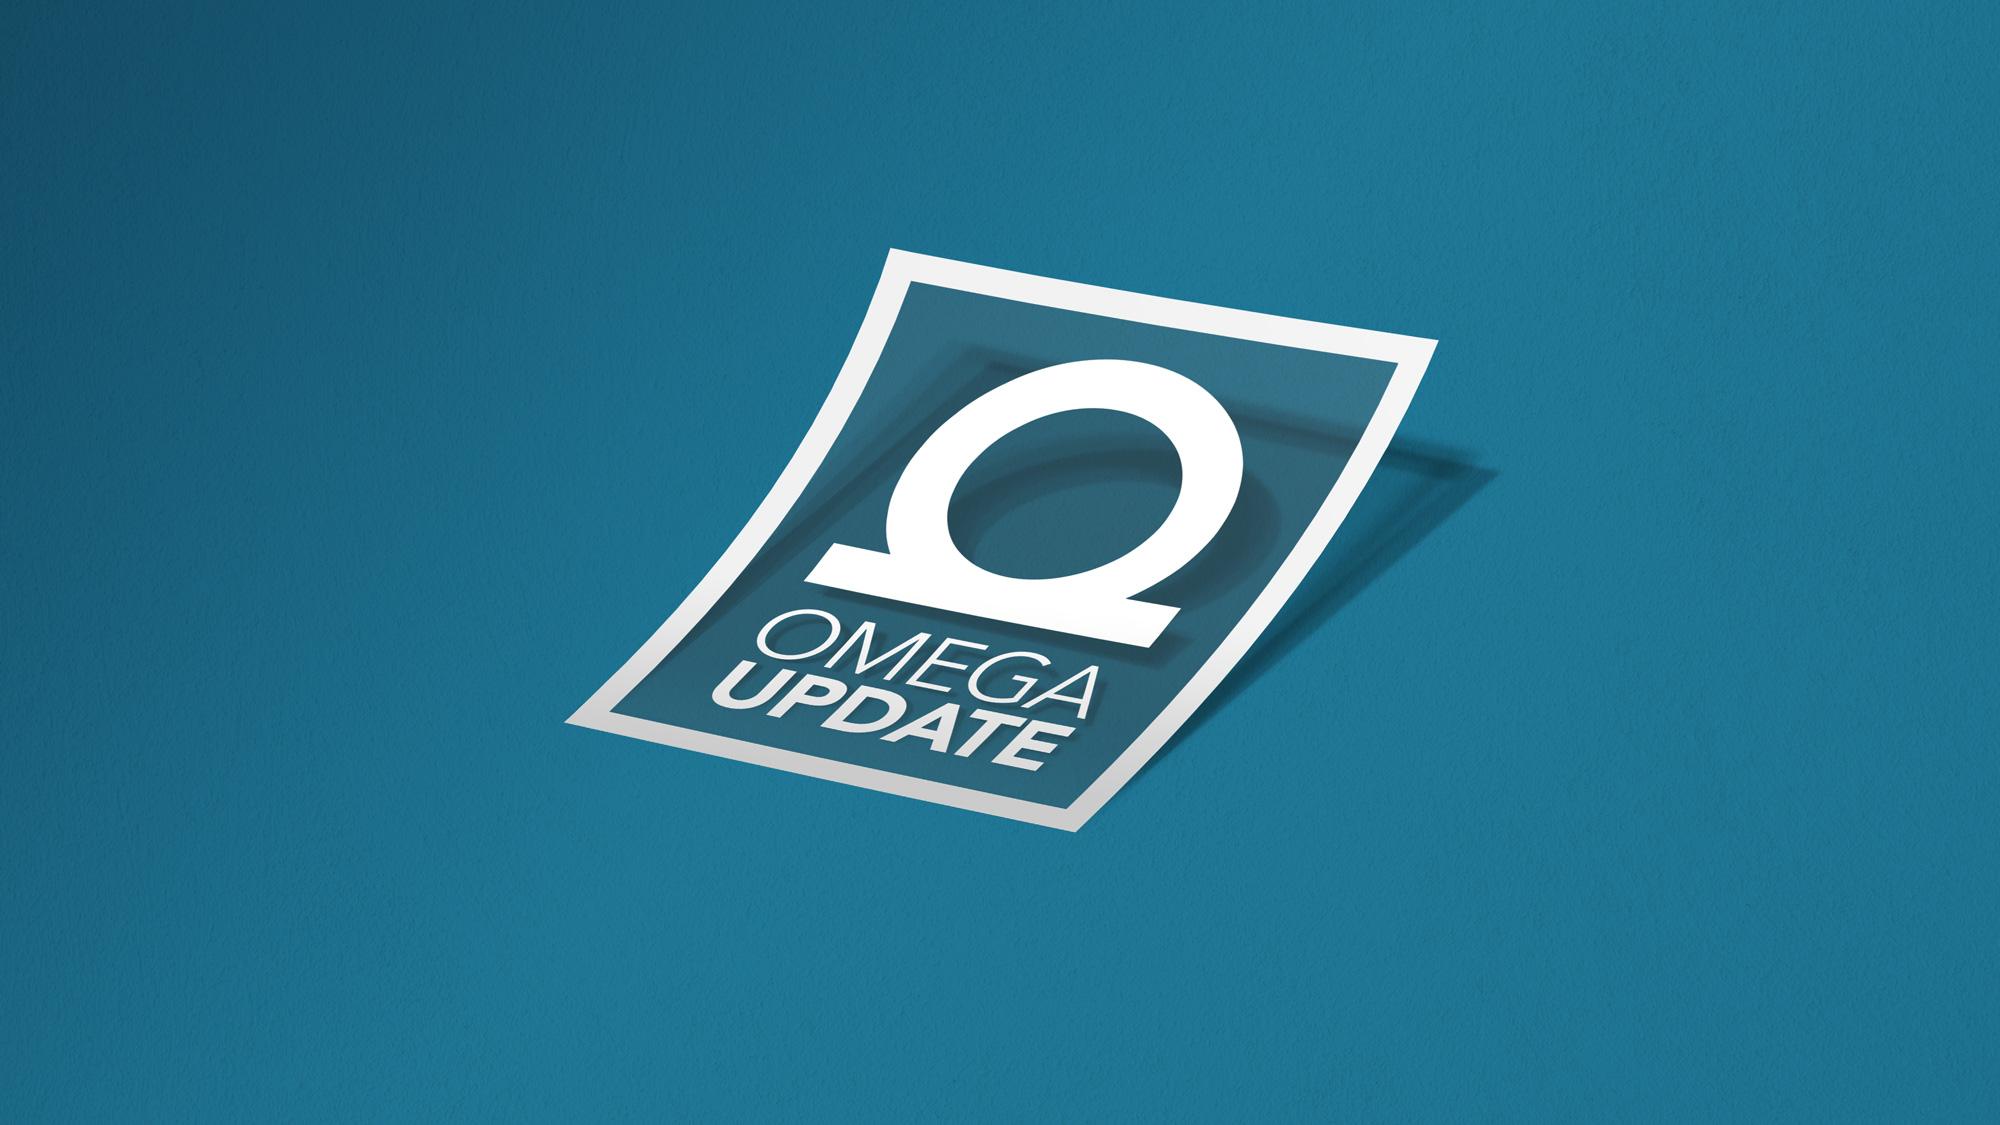 Omega Update logo as a sticker